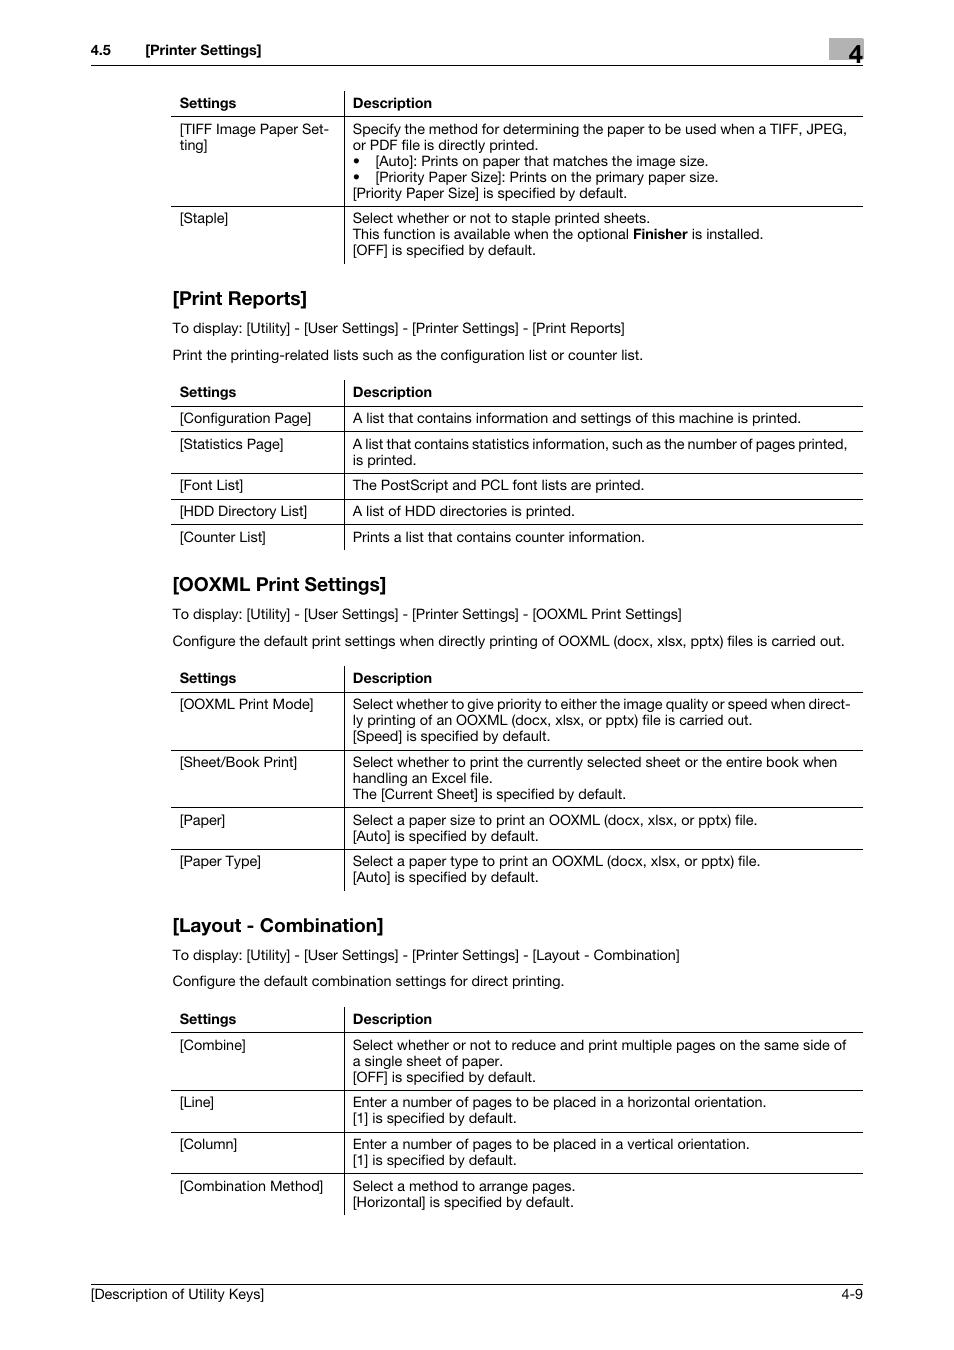 Print reports, Ooxml print settings, Layout - combination